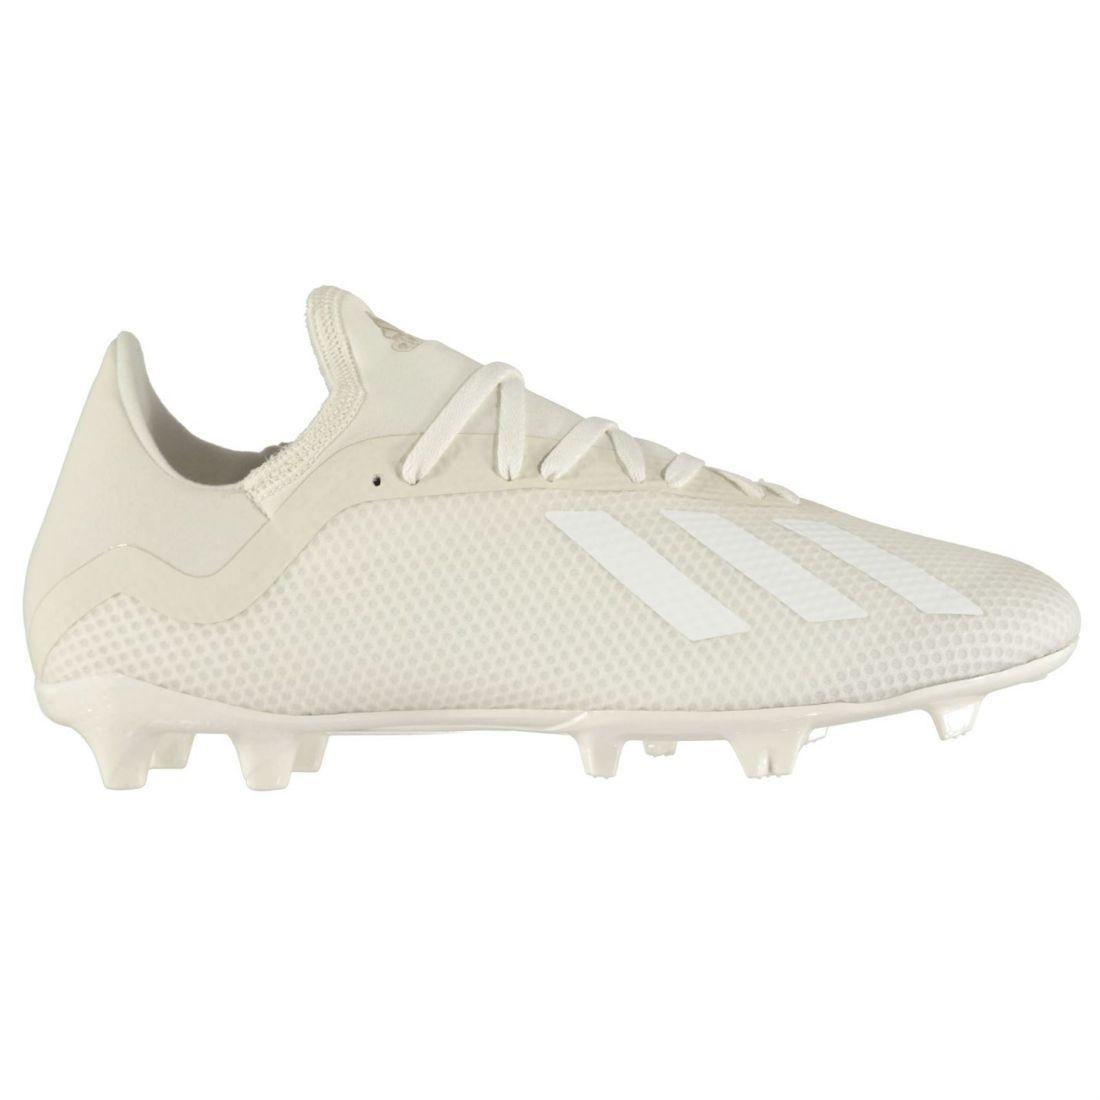 Adidas Mens X 18.3 FG Football Boots Firm Ground Lace Up Lightweight Mesh Upper